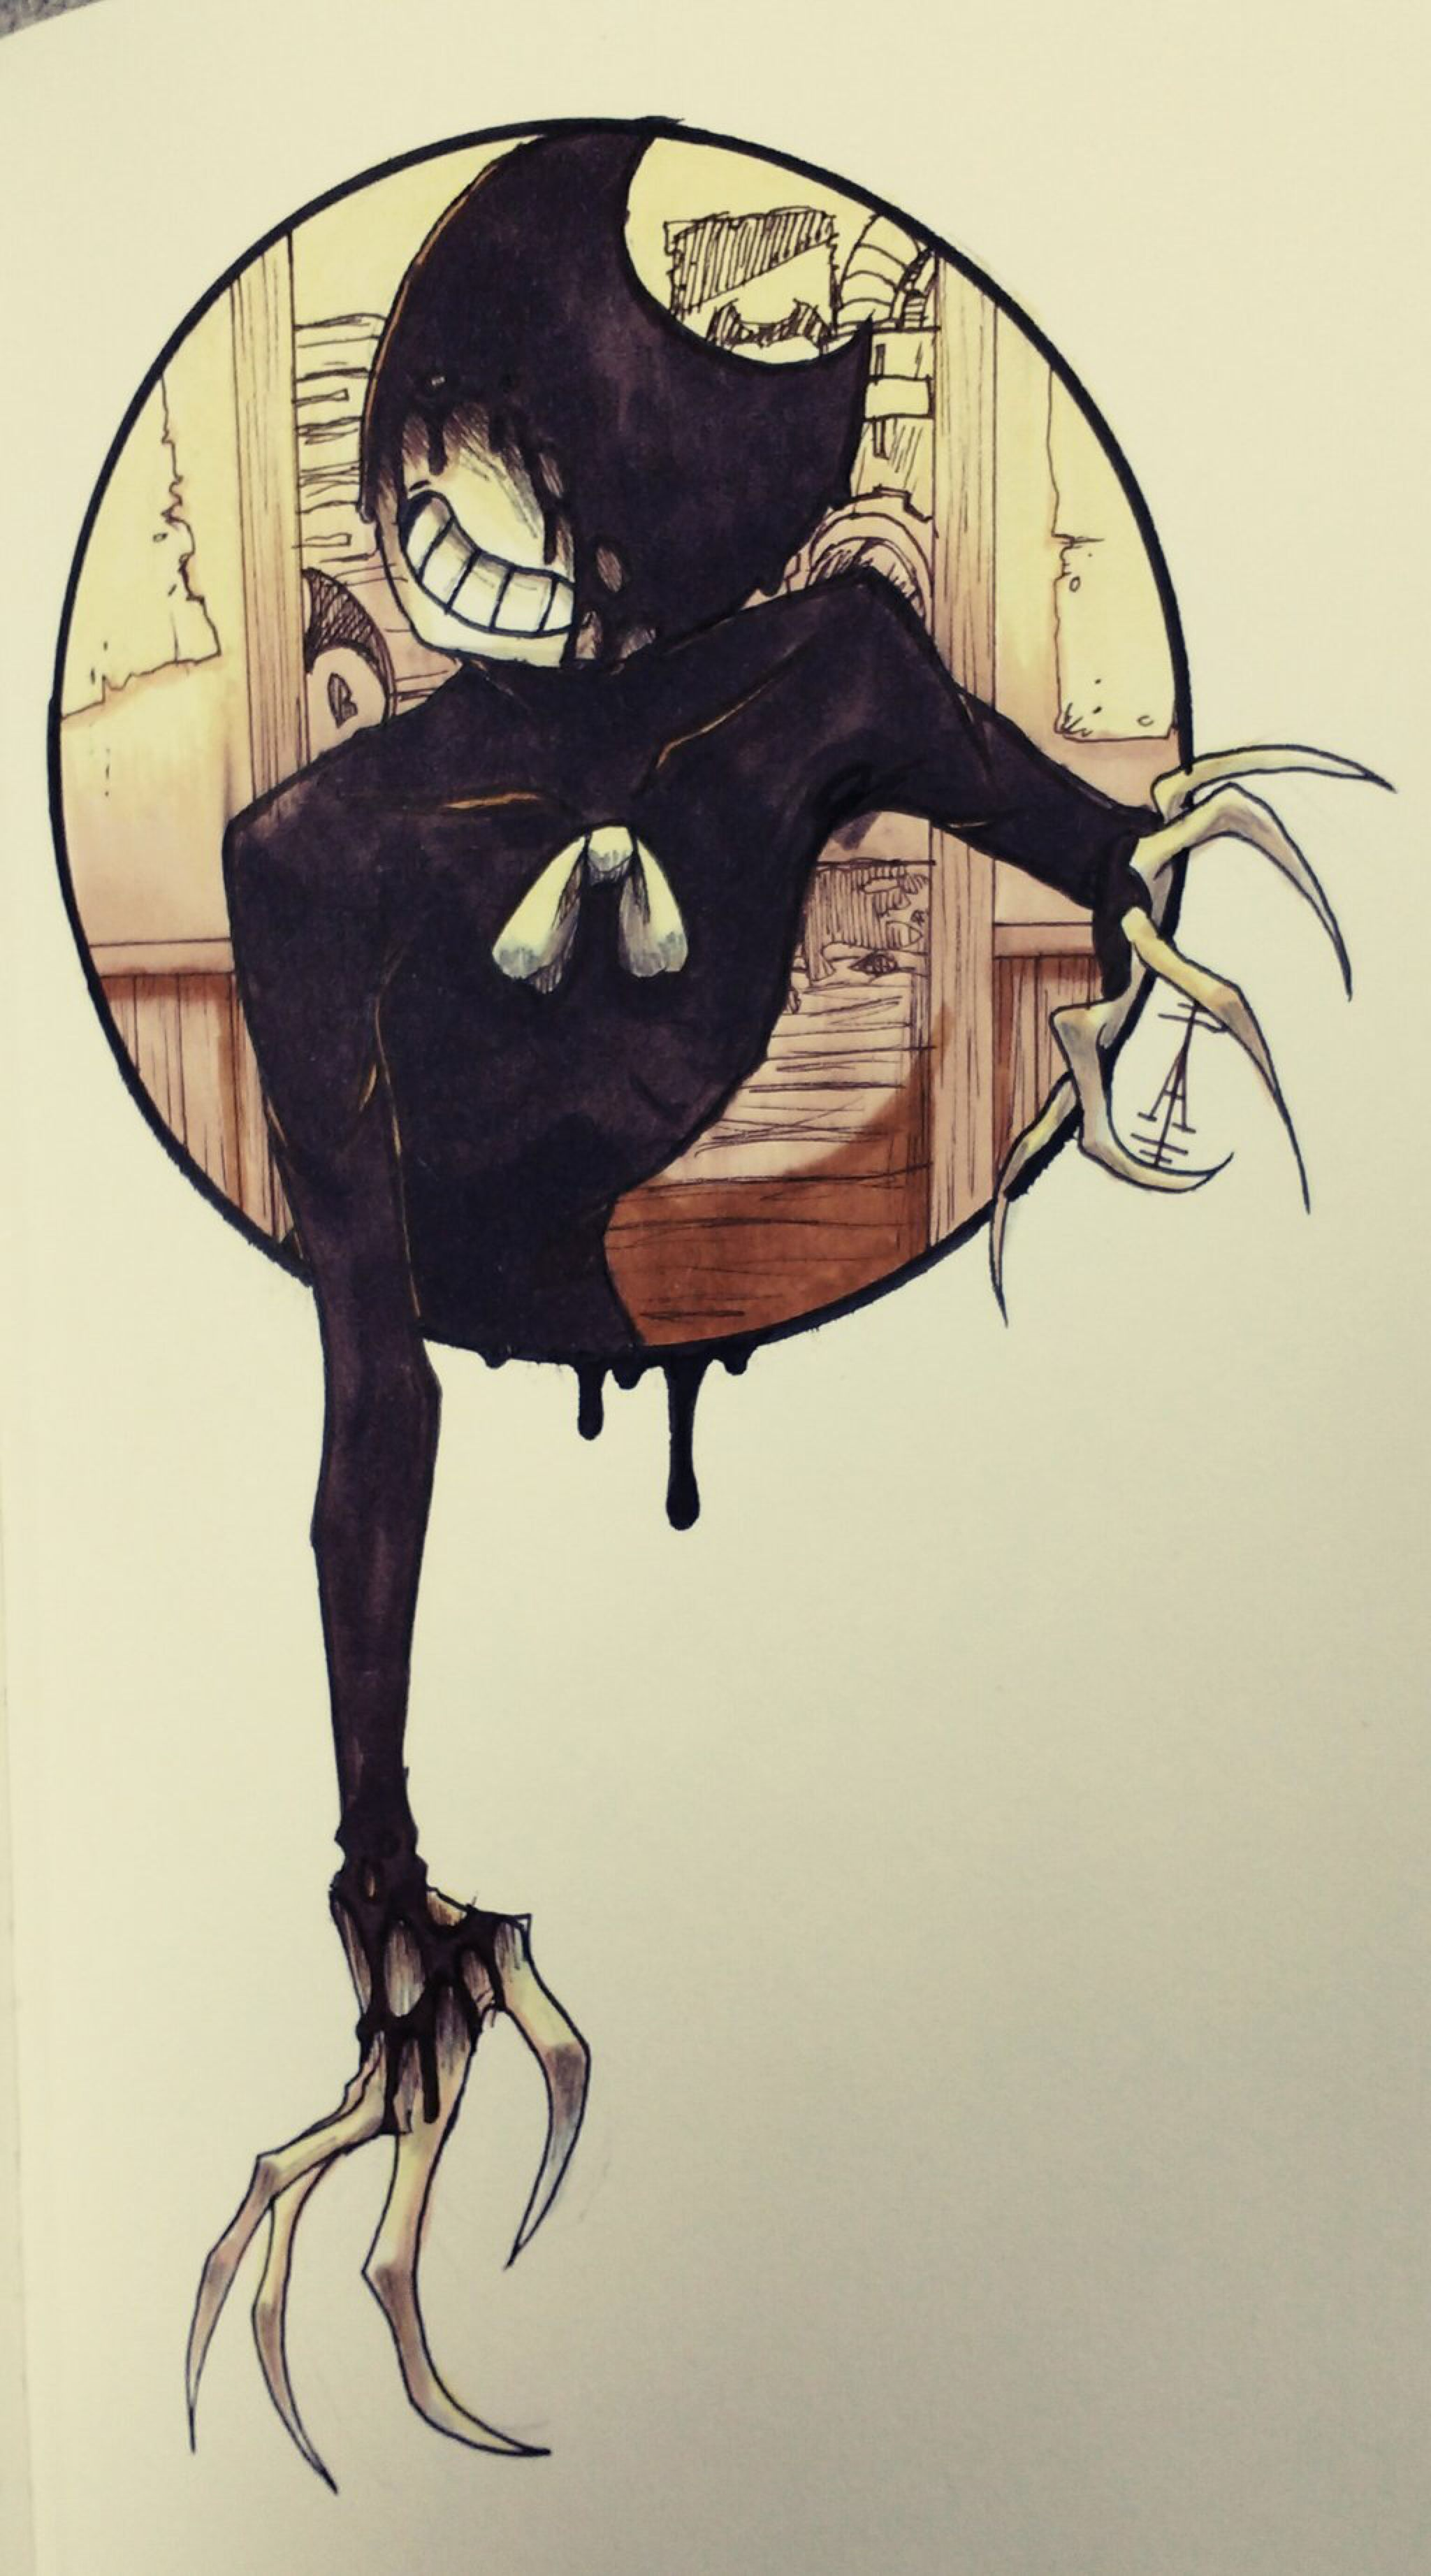 Ink Demon By Akiifunen On Deviantart Bendy And The Ink Machine